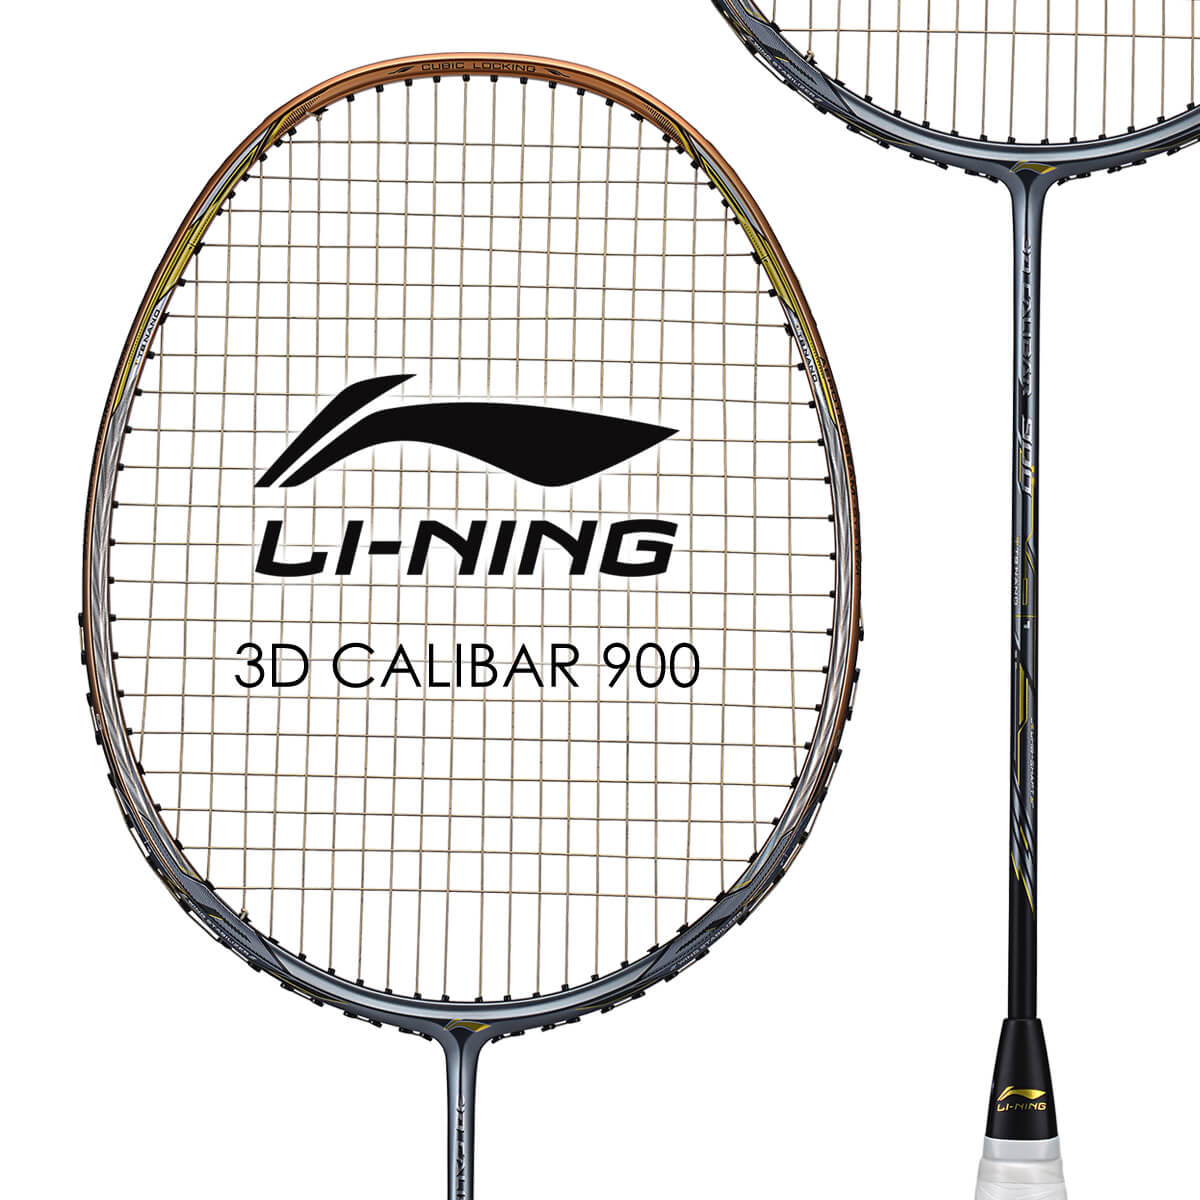 LI-NING 3D CALIBAR 900(3D-C900) 立体風刃 AYPM426-1 バドミントンラケット リーニン【オススメガット&ガット張り工賃無料/ 日本バドミントン協会審査合格品】